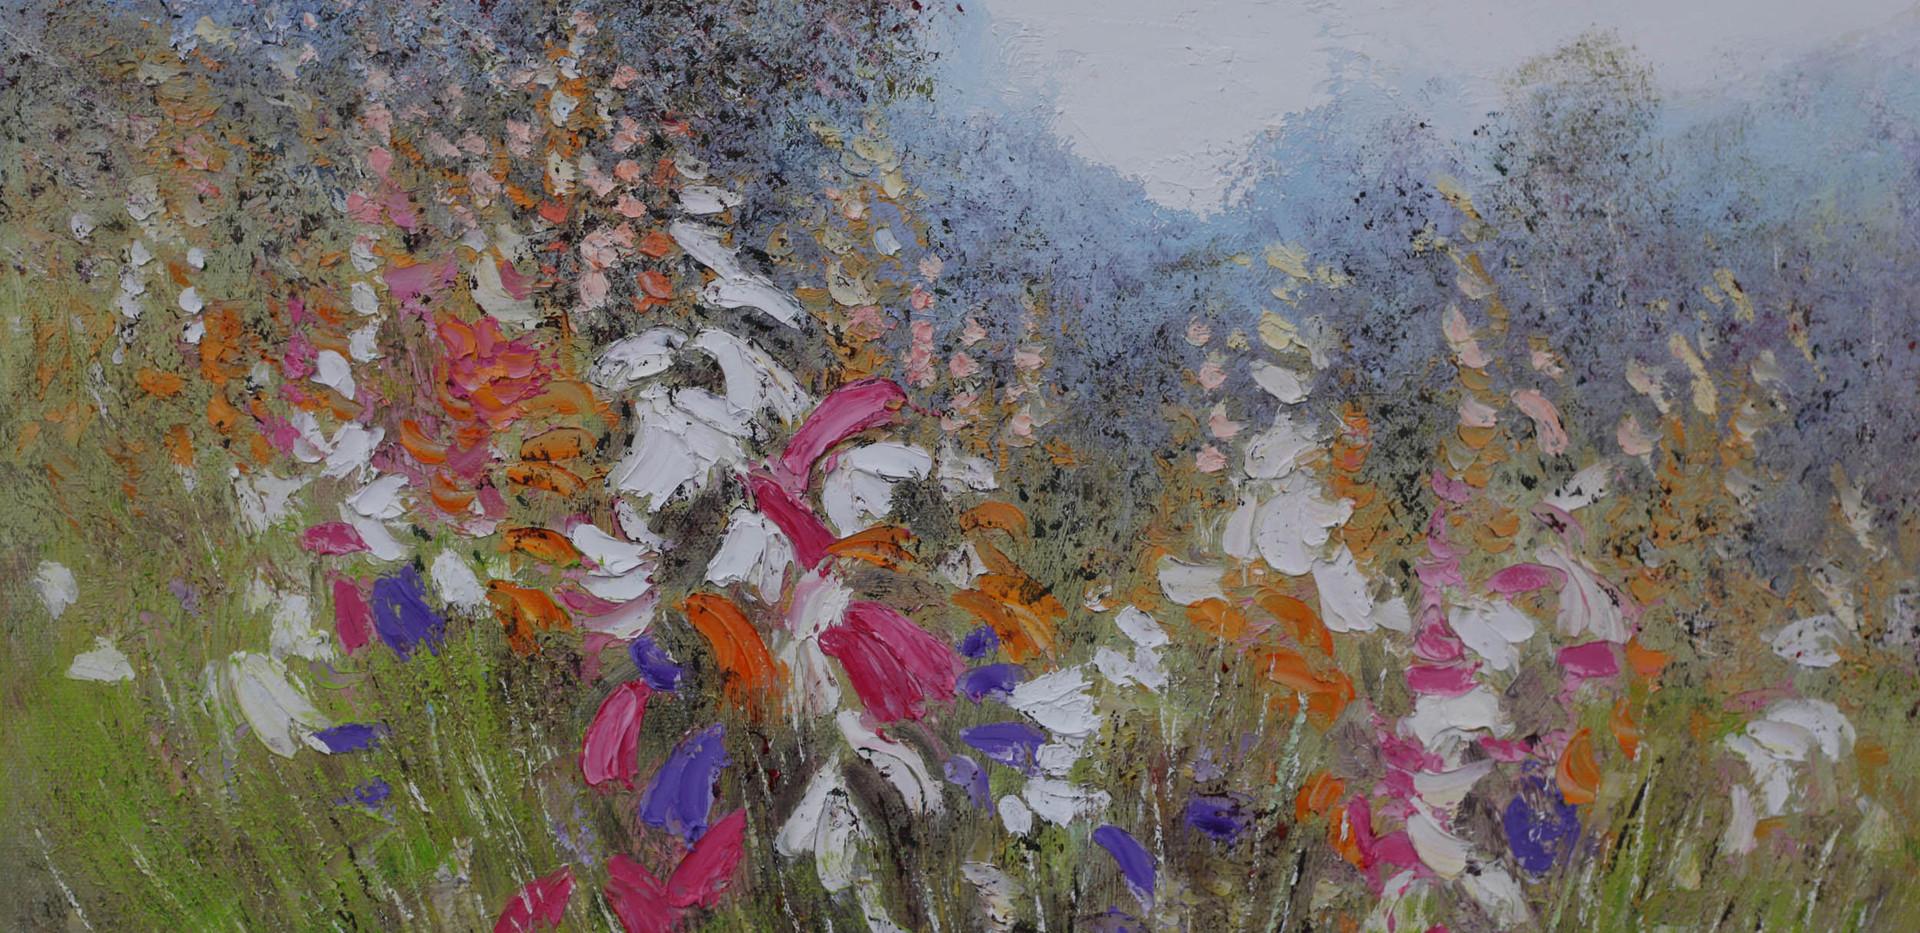 Outback Wildflowers 51cm x 40cm